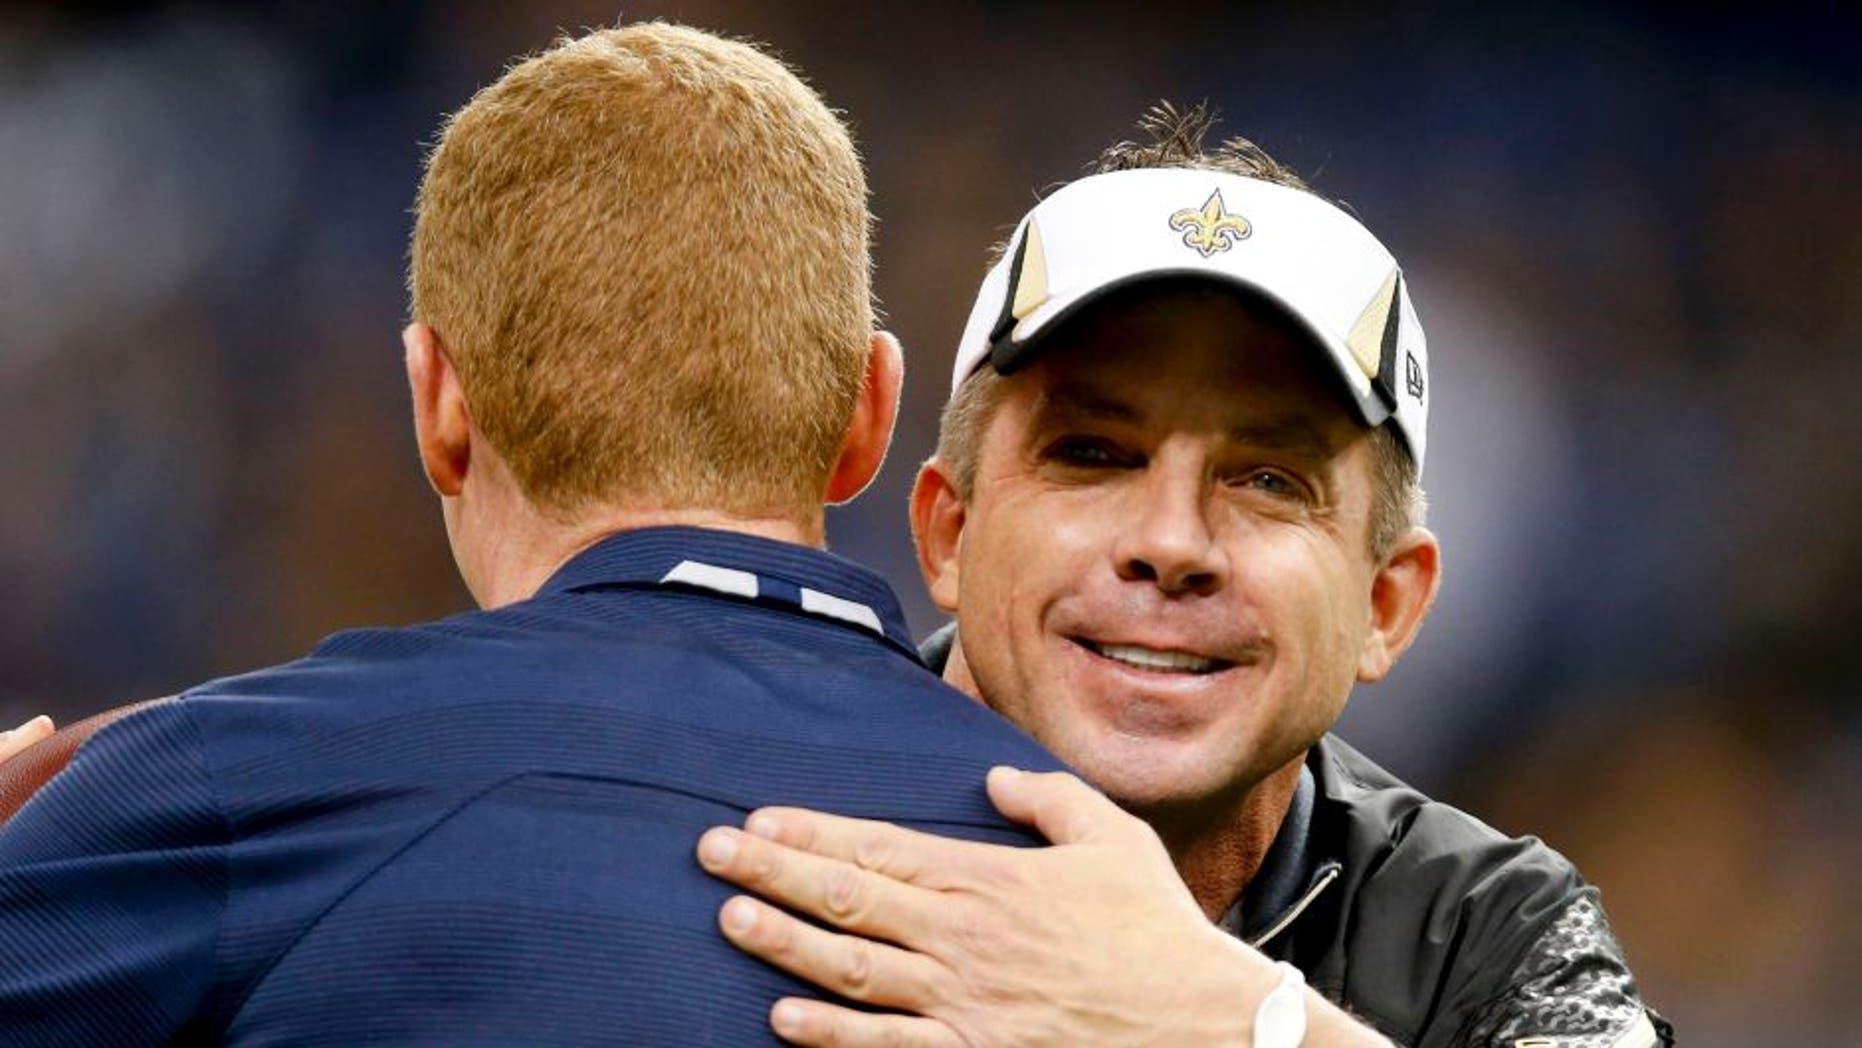 Nov 10, 2013; New Orleans, LA, USA; New Orleans Saints head coach Sean Payton greets Dallas Cowboys head coach Jason Garrett prior to a game at Mercedes-Benz Superdome. Mandatory Credit: Derick E. Hingle-USA TODAY Sports